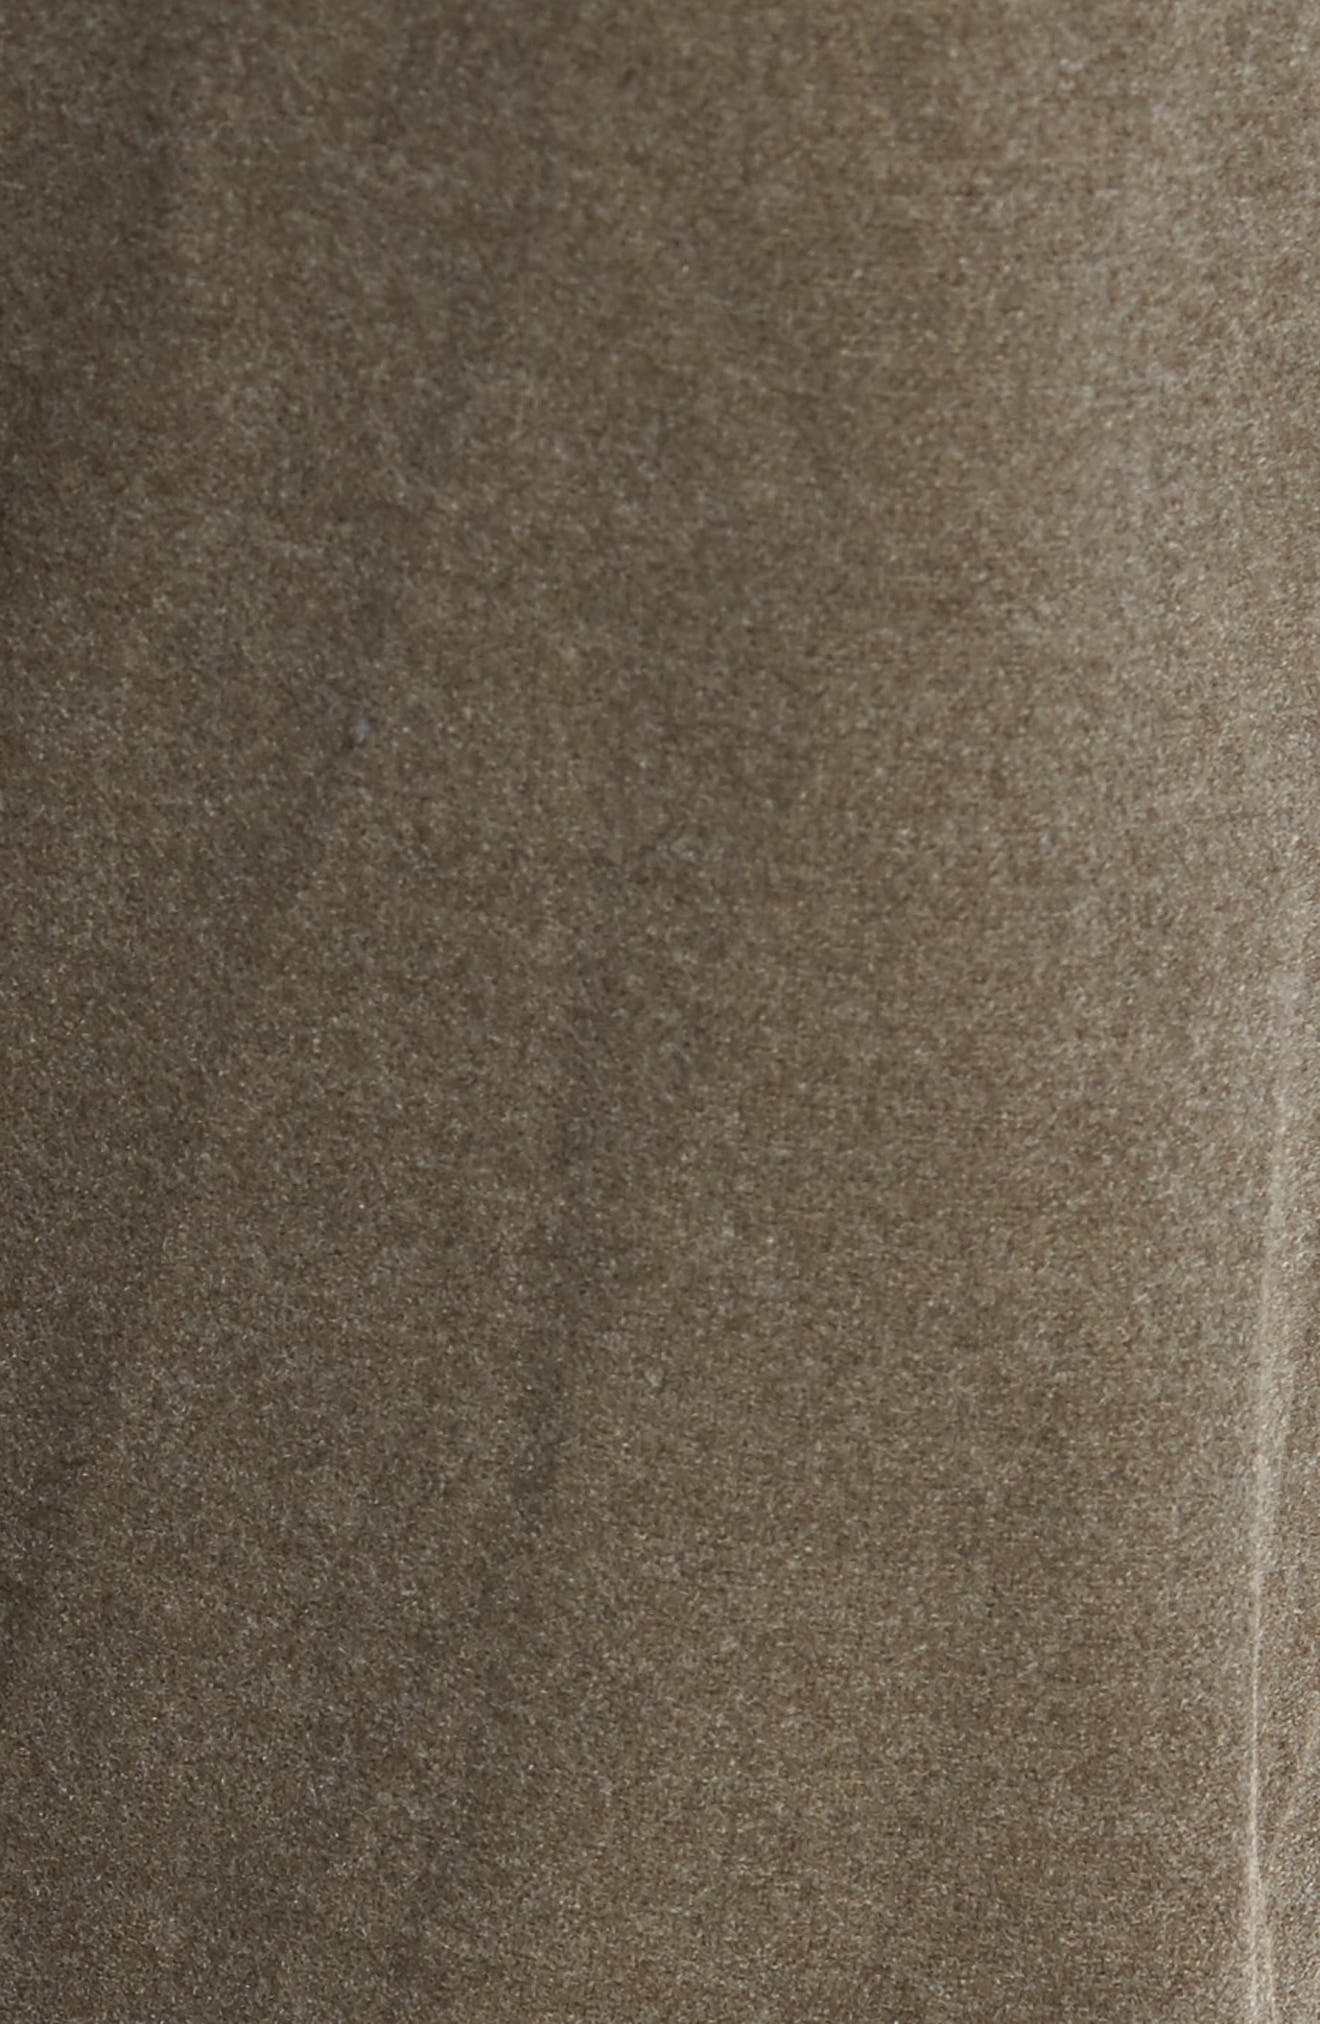 Graduate Tailored Five-Pocket Straight Leg Pants,                             Alternate thumbnail 5, color,                             CLIMBING IVY